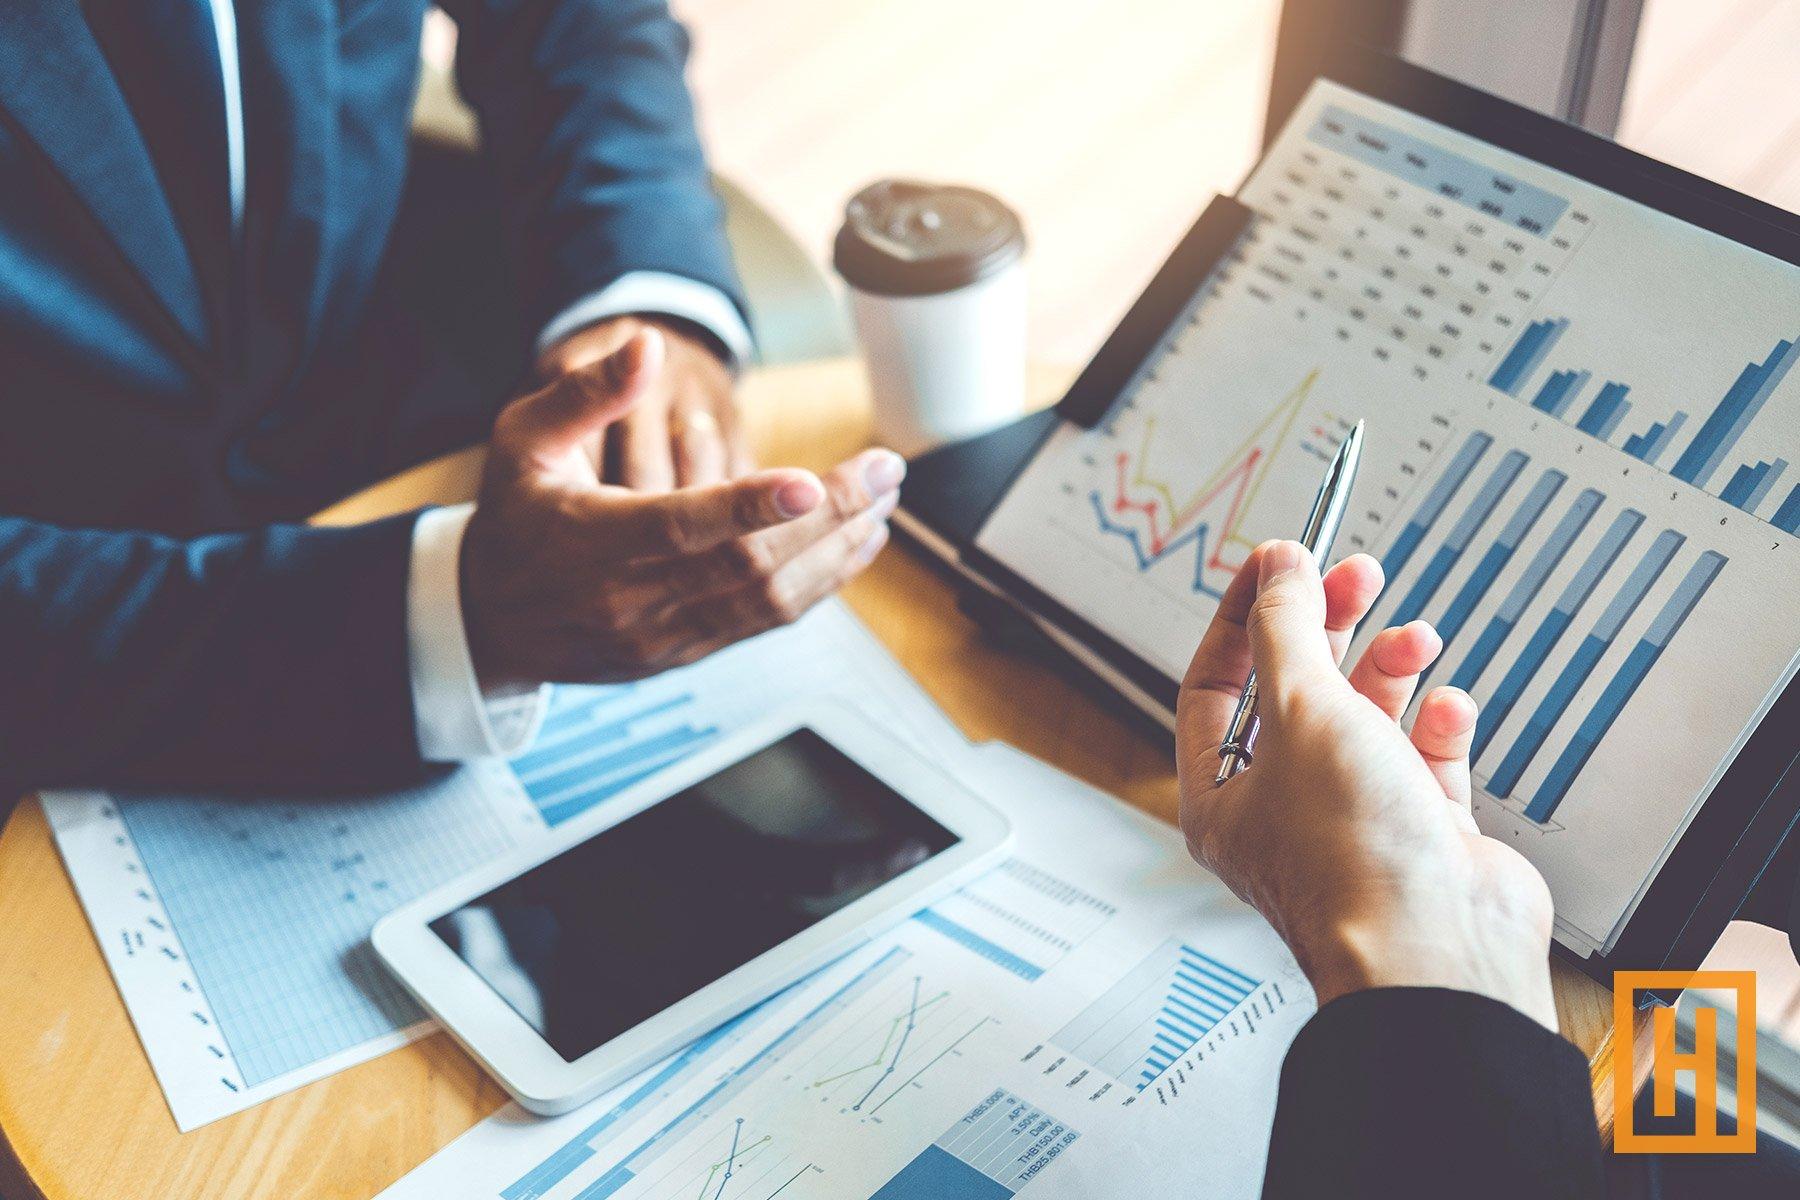 Investors working and brainstorming